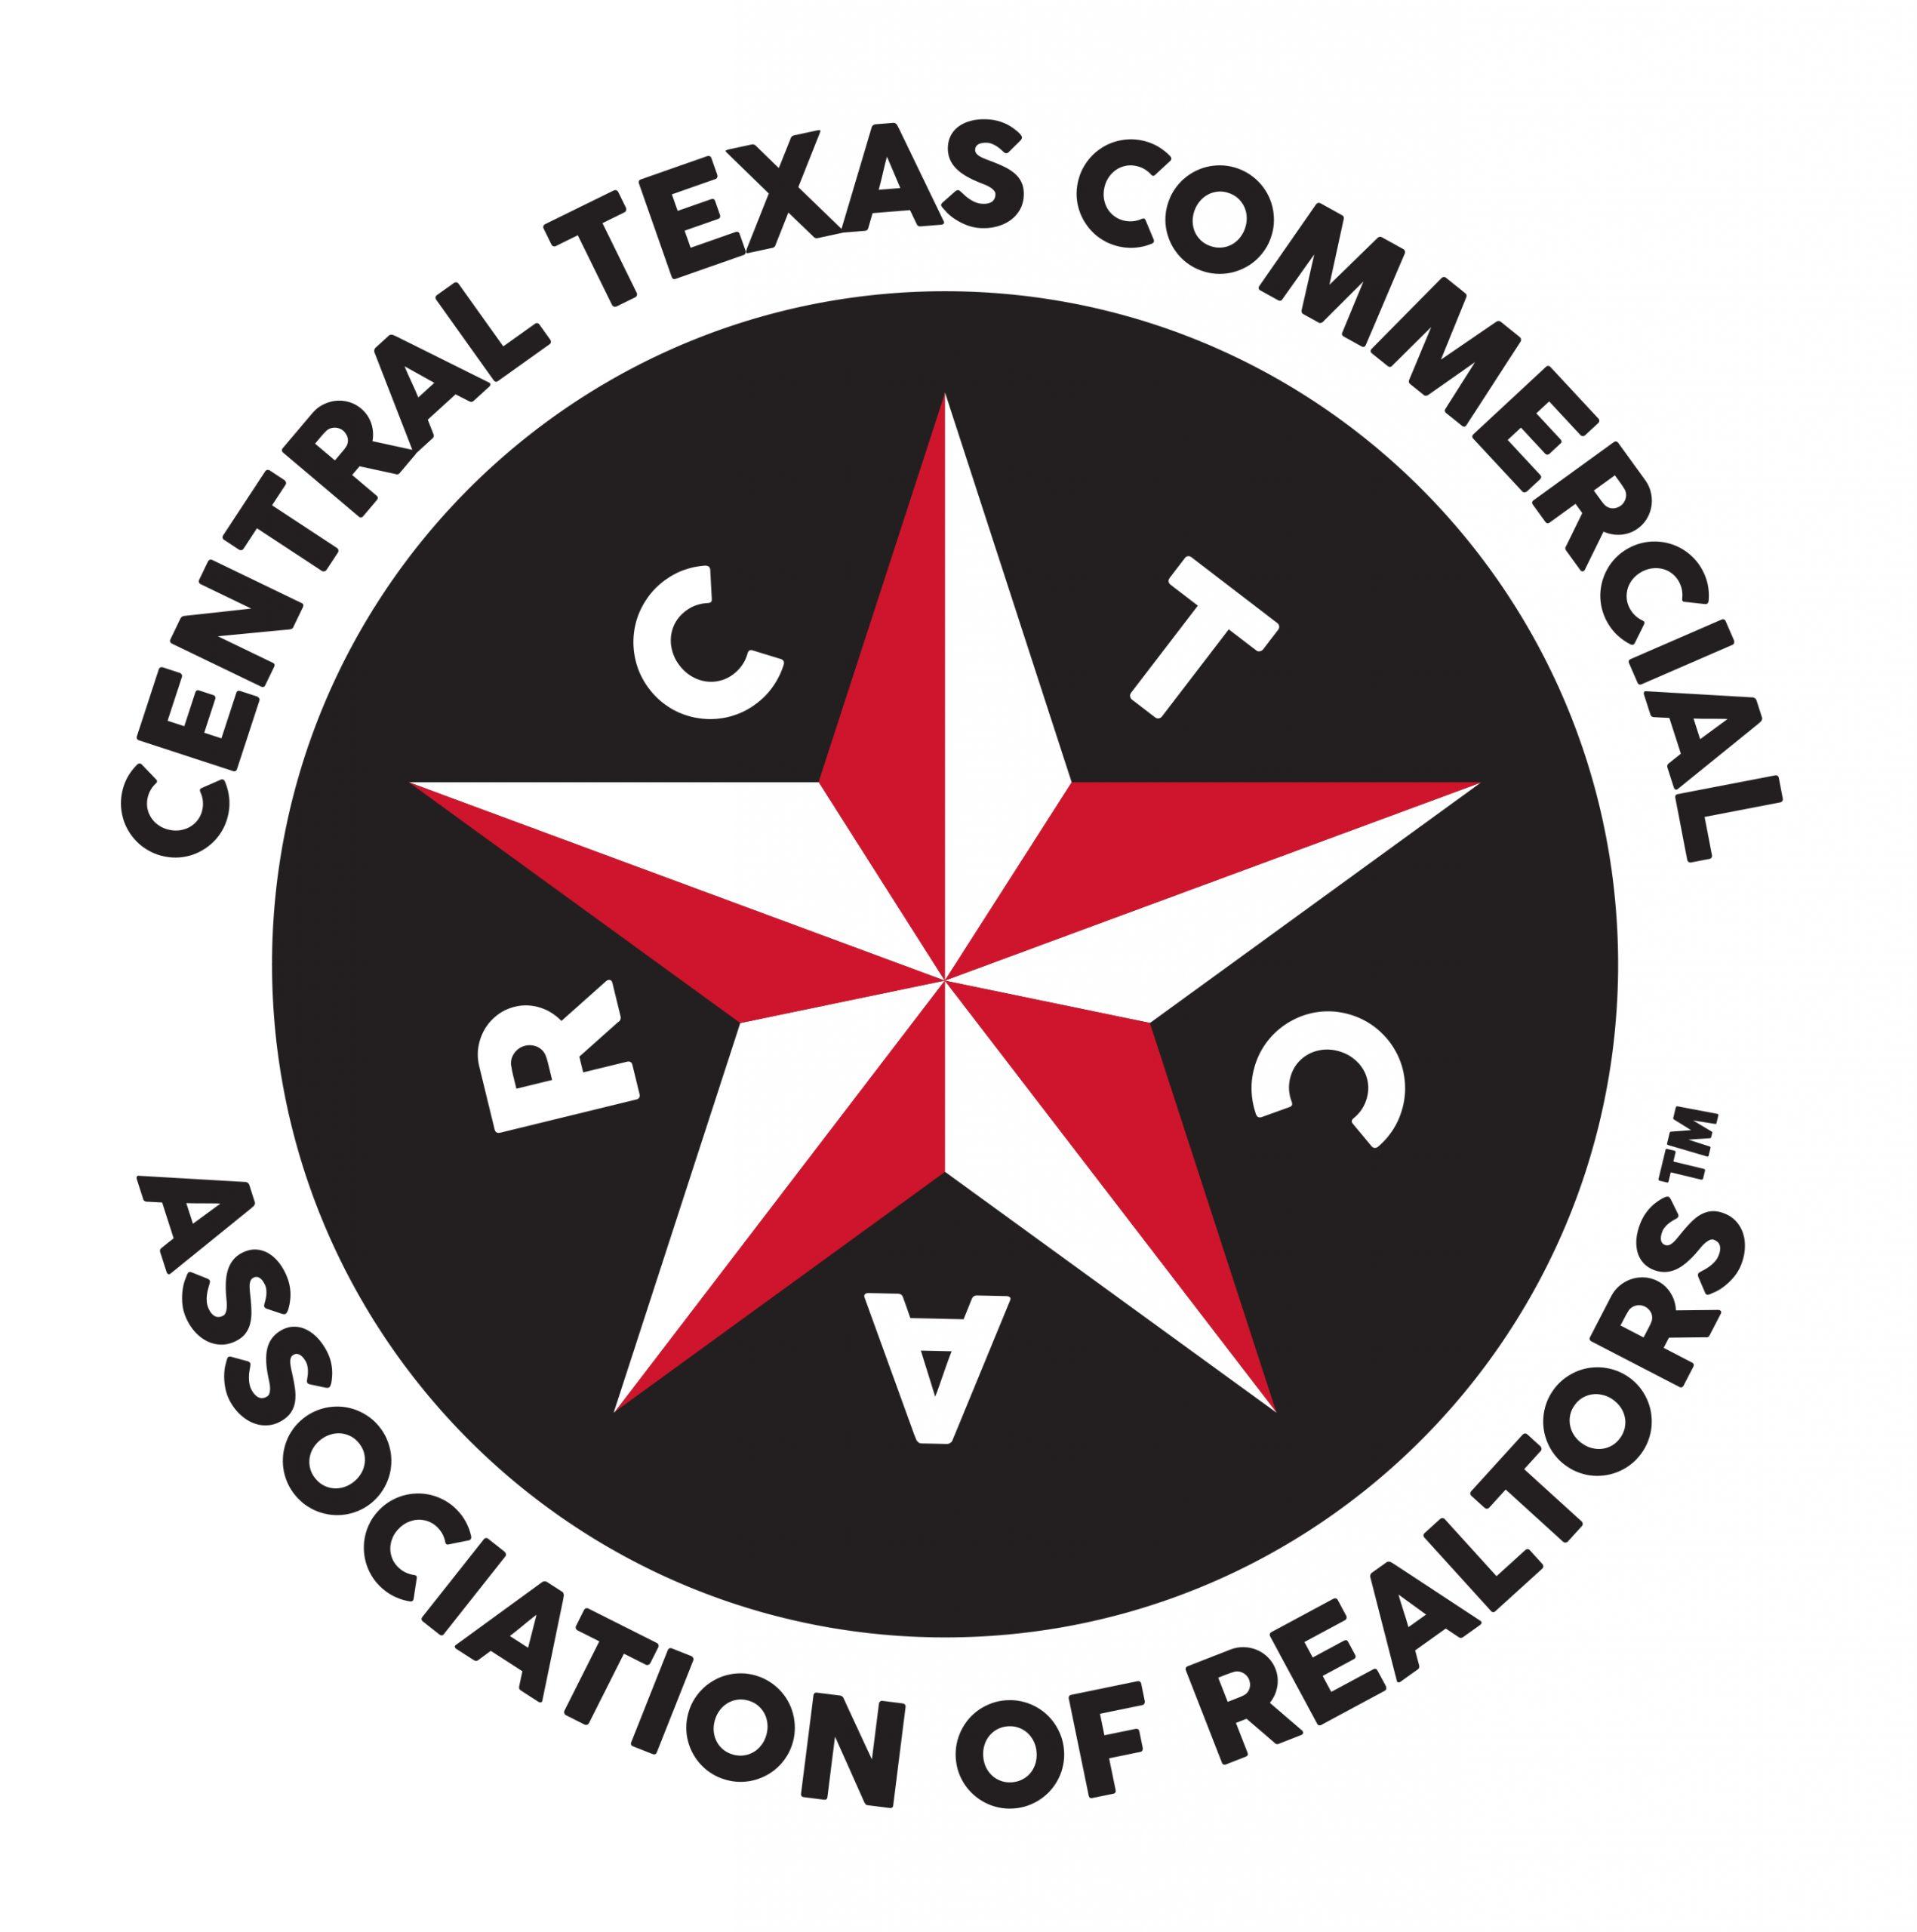 Central Texas Commercial Association of REALTORS® 2021 C5 Summit Exhibitor Logo